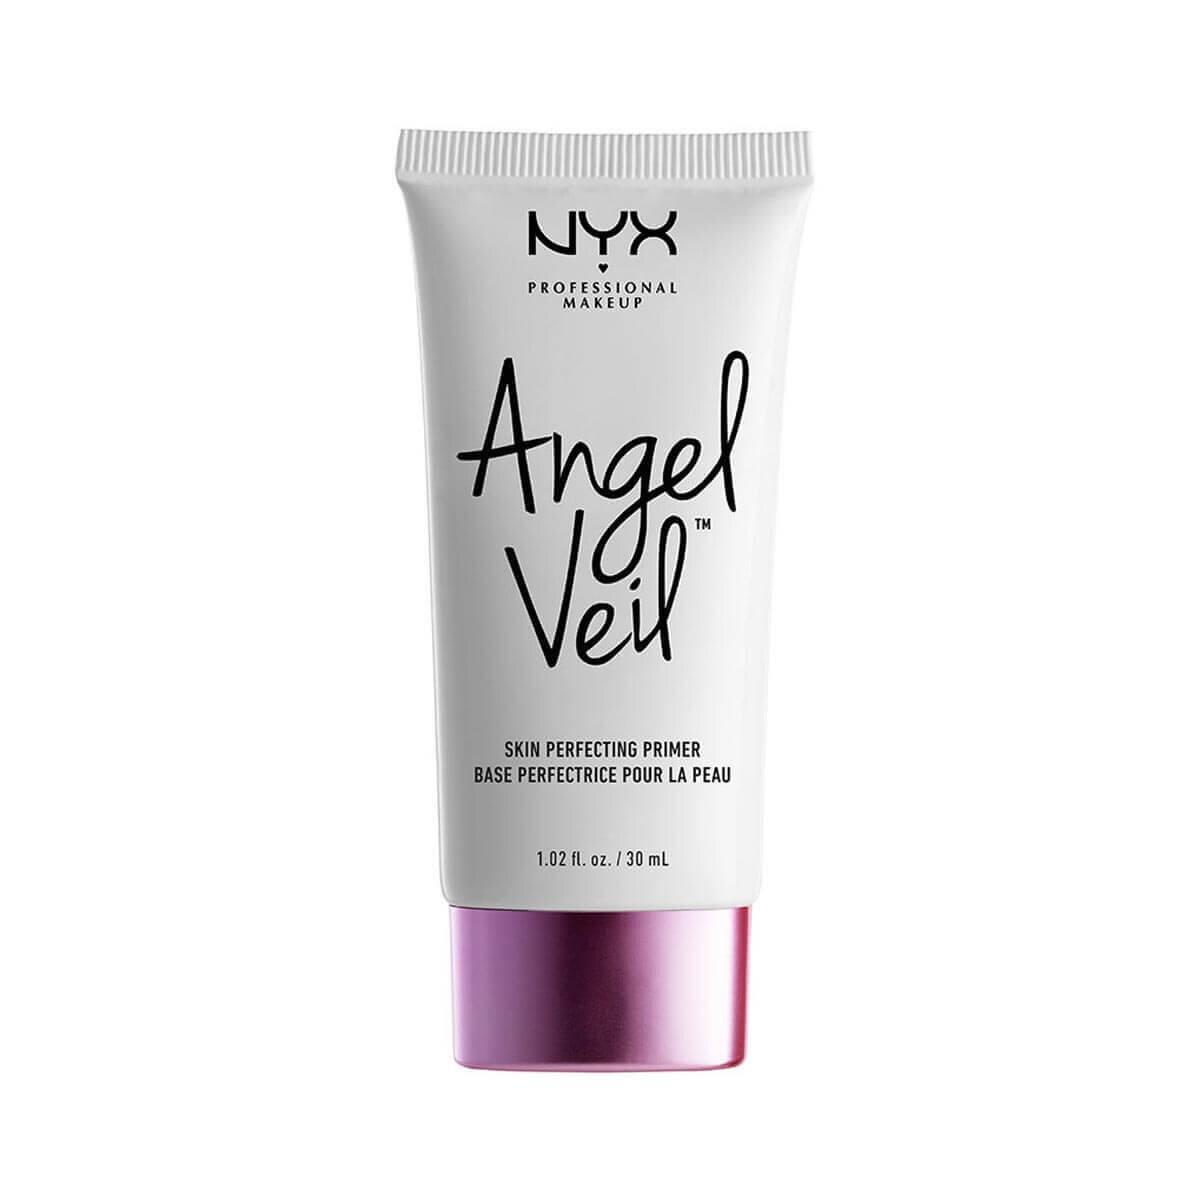 Angel Veil Skin Perfecting Primer Skin Perfecting Primer